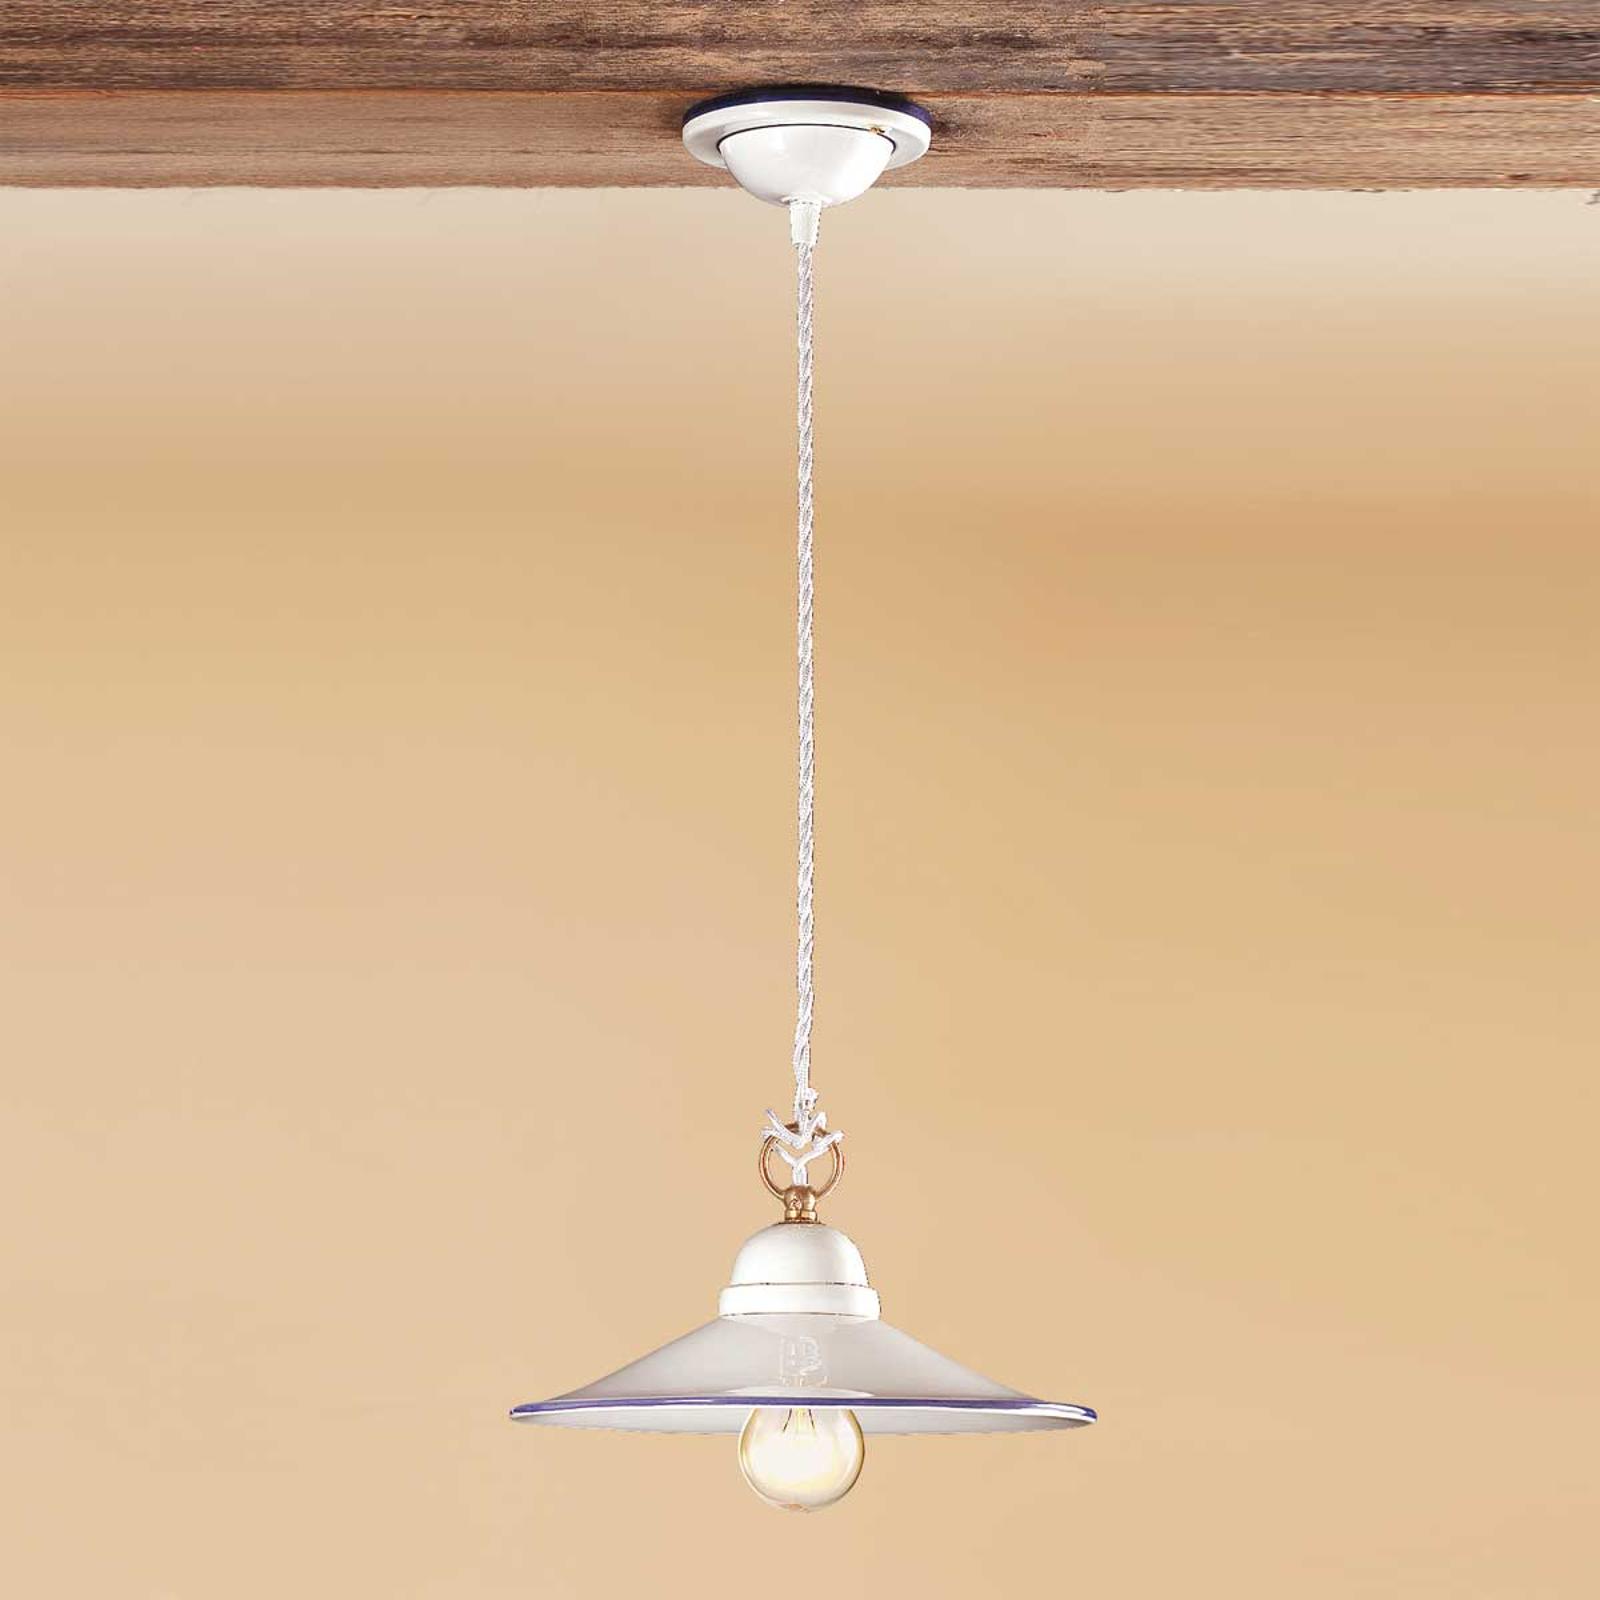 Attractive PIATTO hanging light made of ceramic_2013008X_1